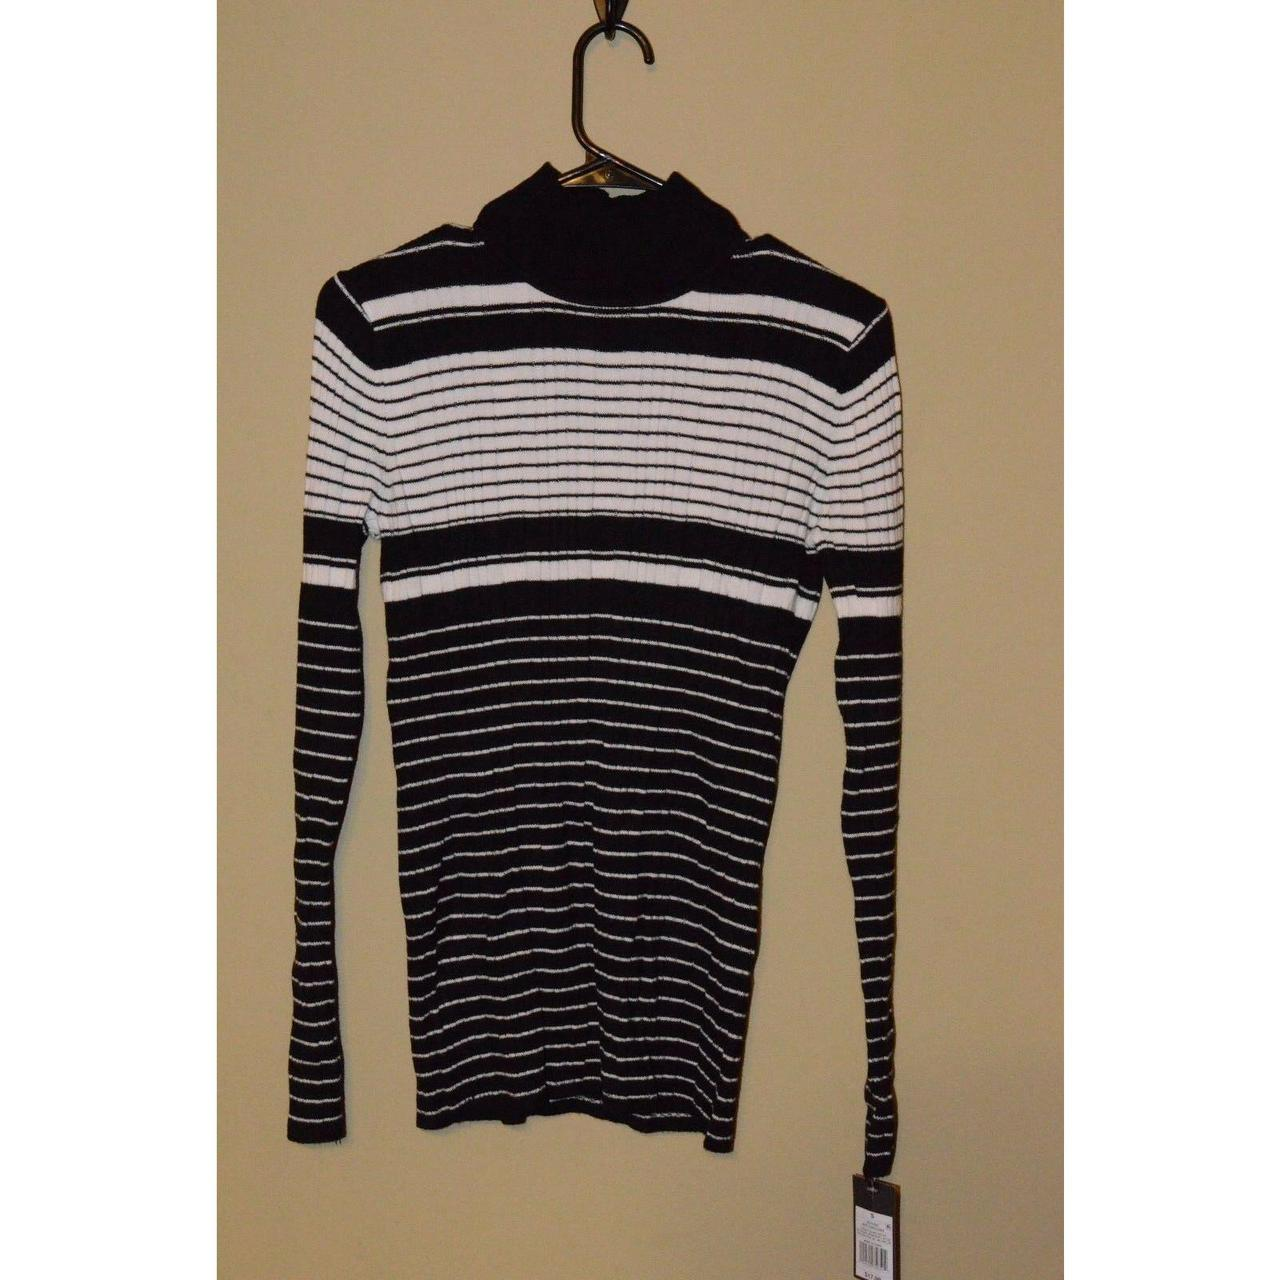 Product Image 1 - Mossimo knit long sleeve shirt